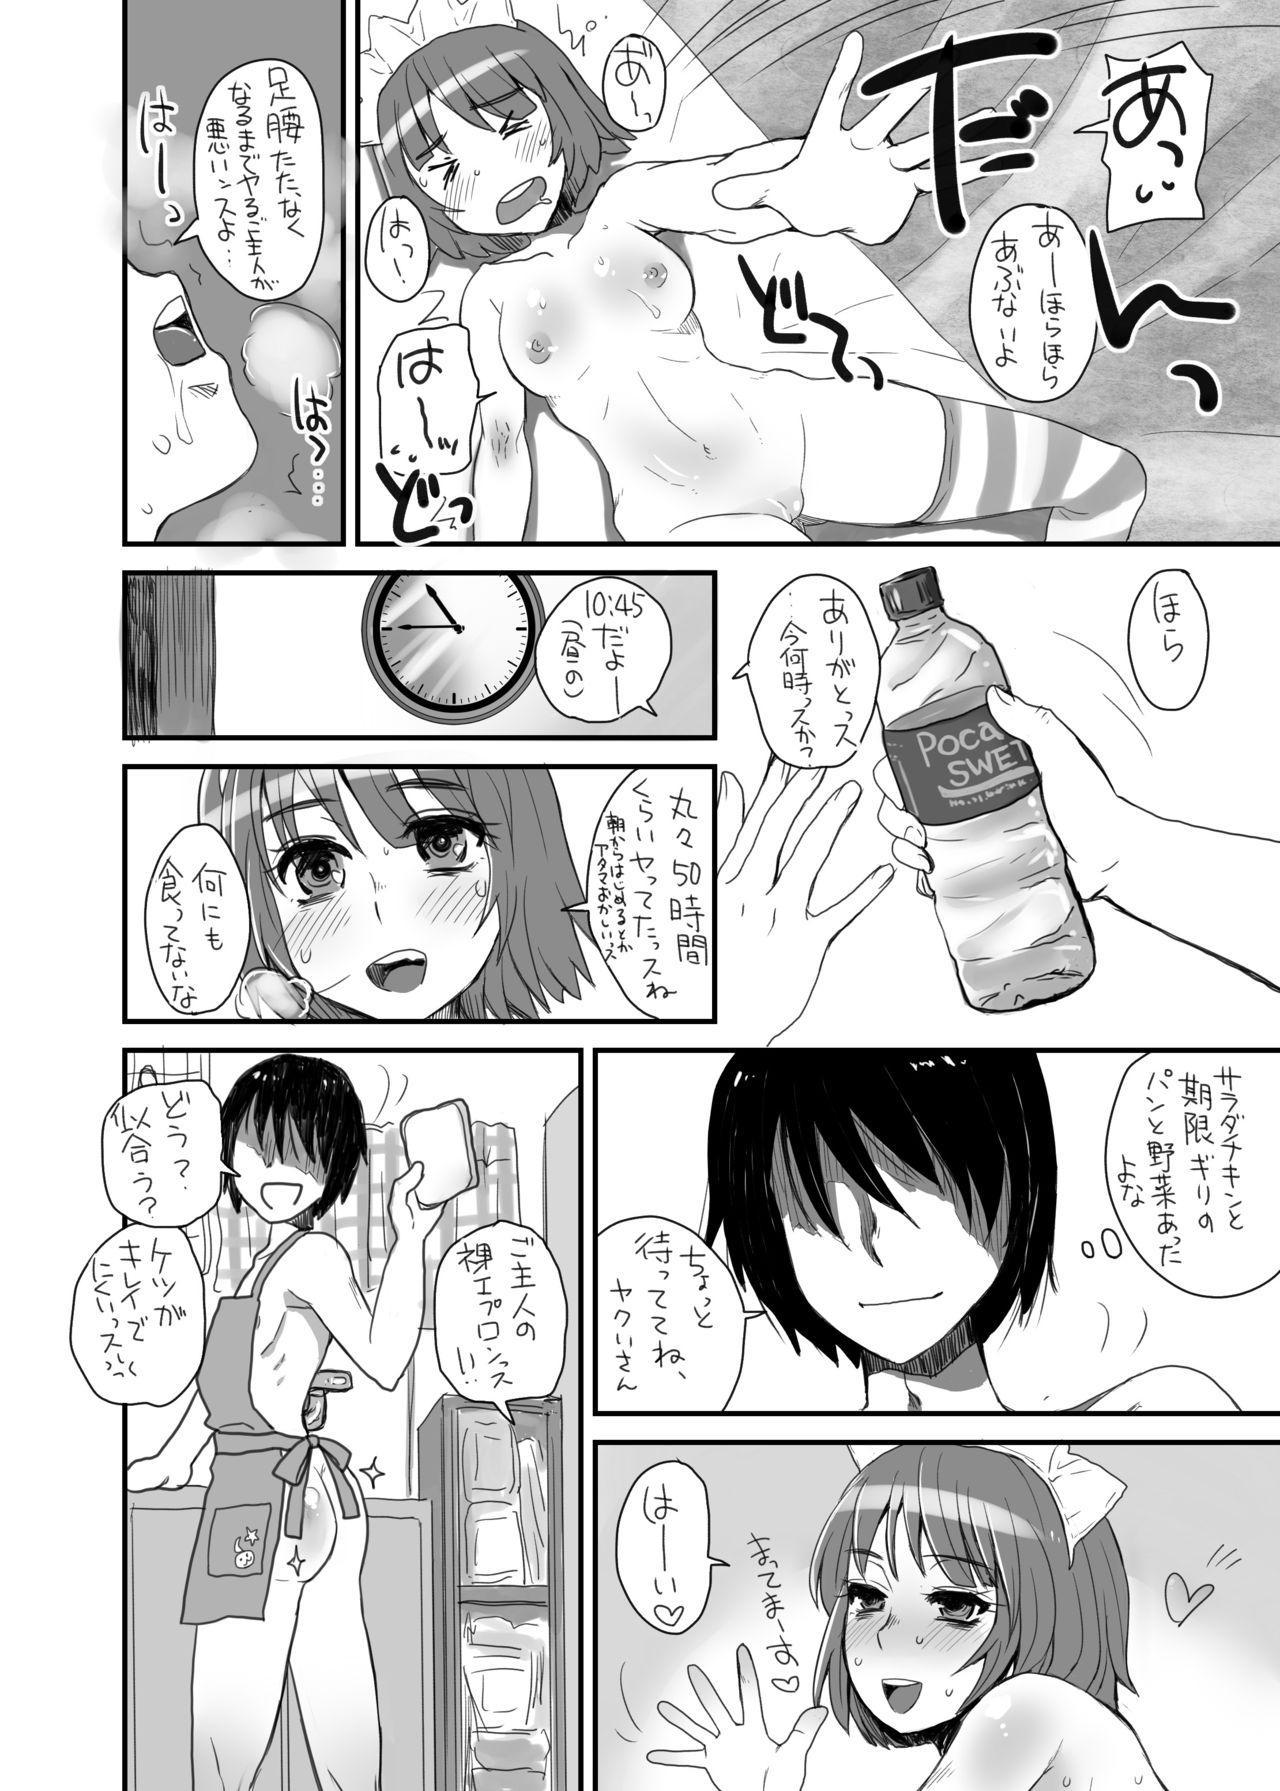 [Sarurururu (Doru Riheko)] Yakui-san Ero  Soushuuhen 2013-2016 (Nijiura Maids) [Digital] 56